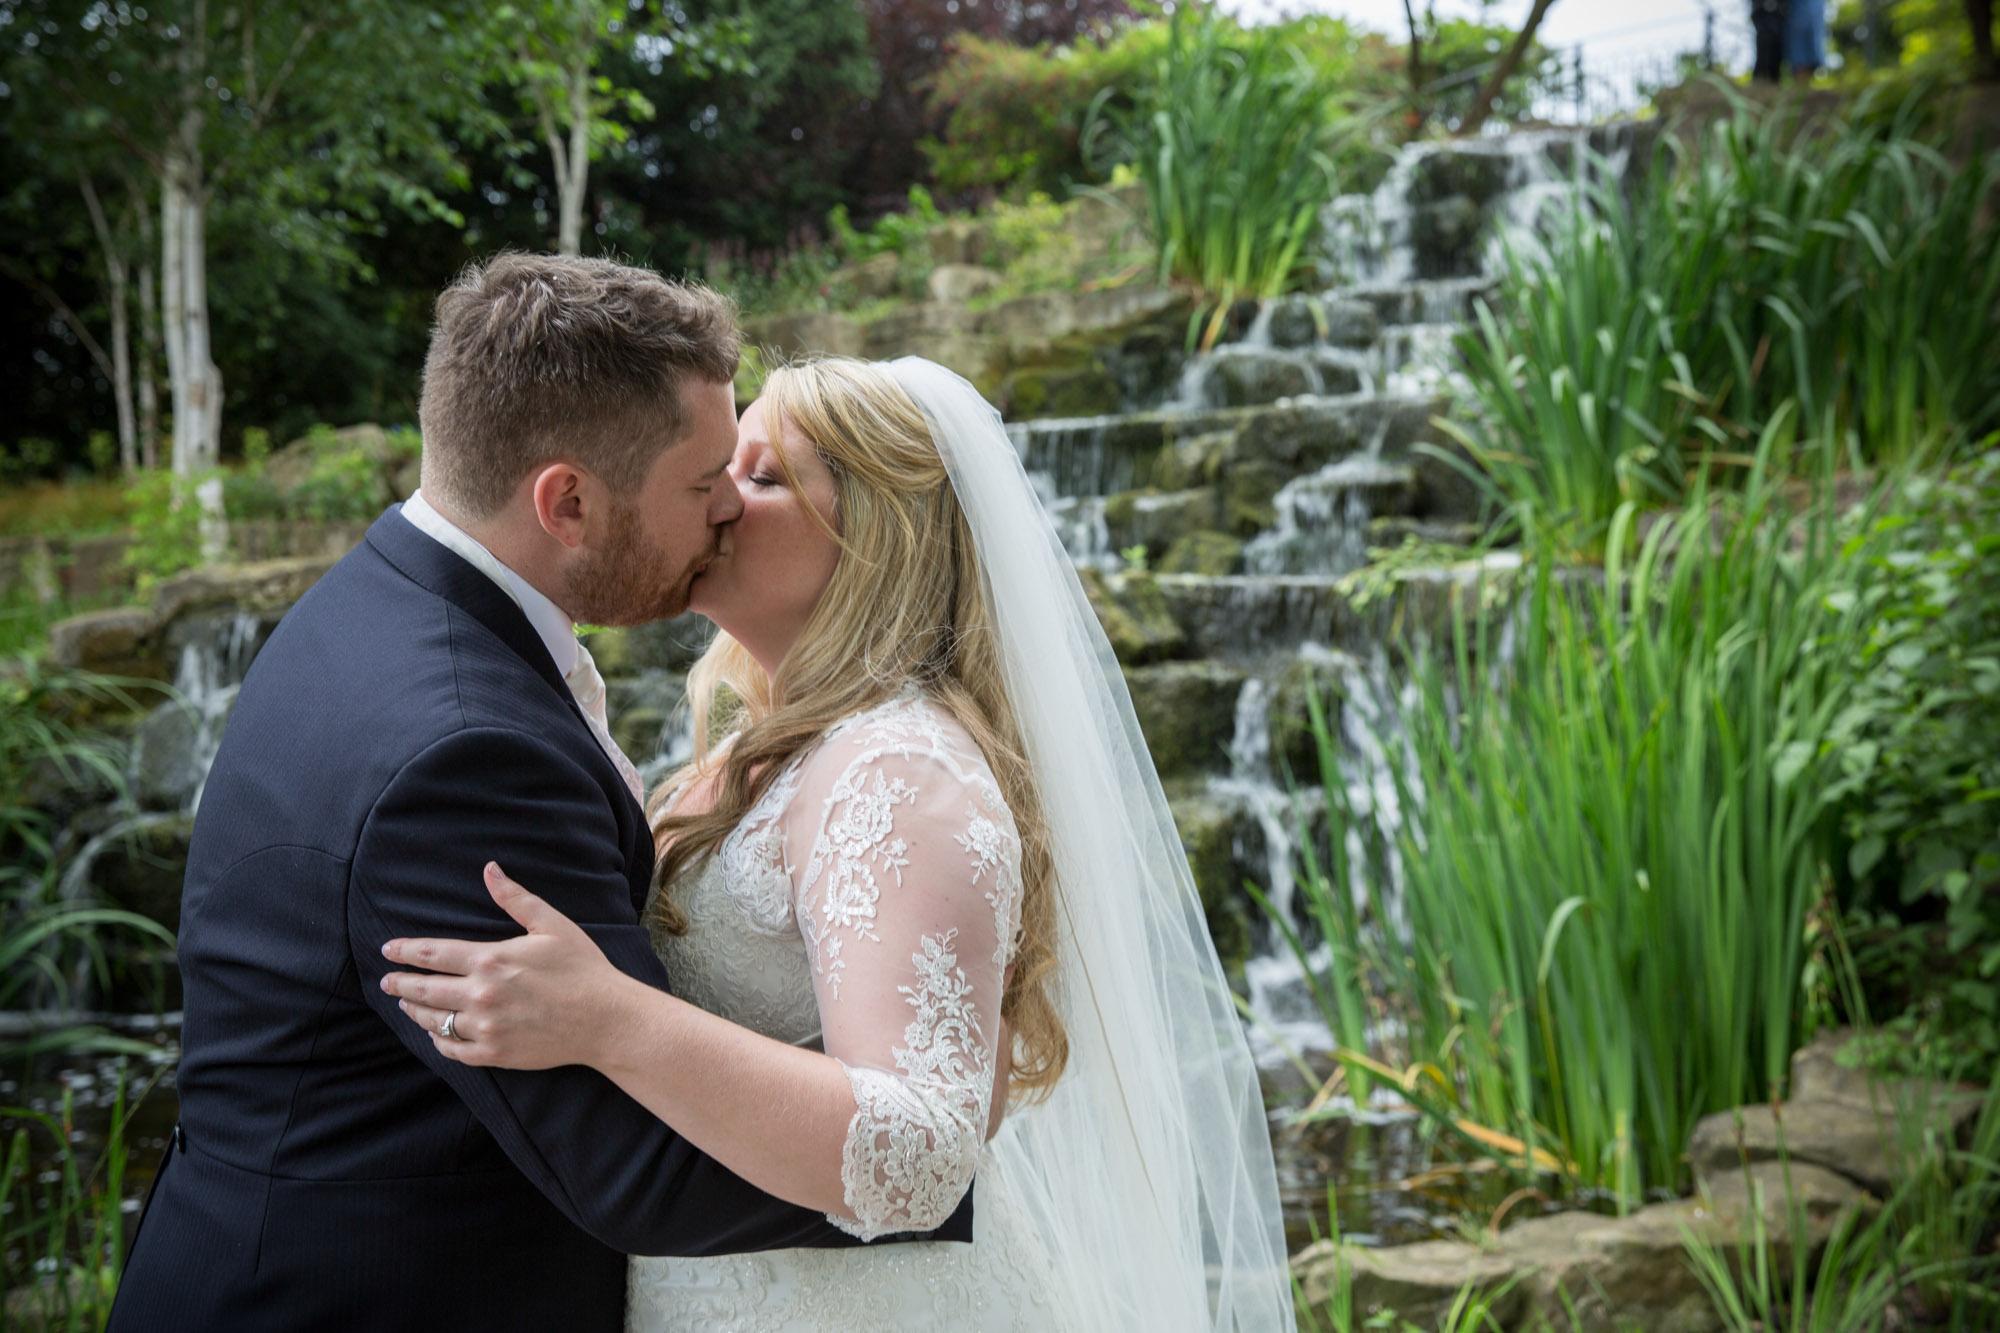 weddings-couples-love-photographer-oxford-london-jonathan-self-photography-91.jpg